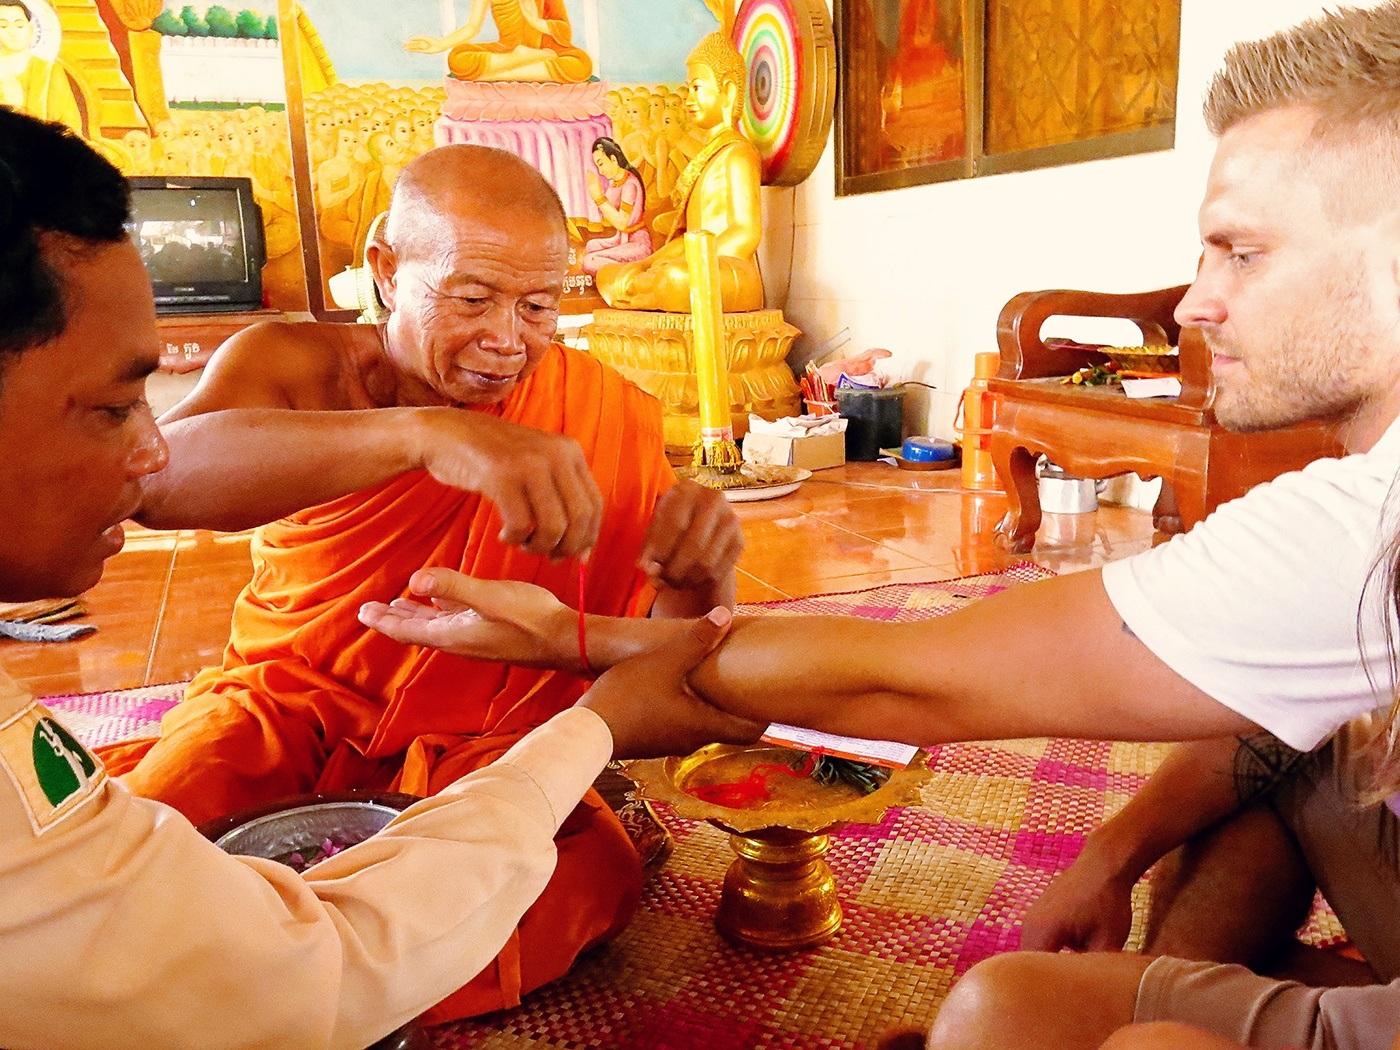 Seated saffron-robed monk tying a cord around a man's wrist.